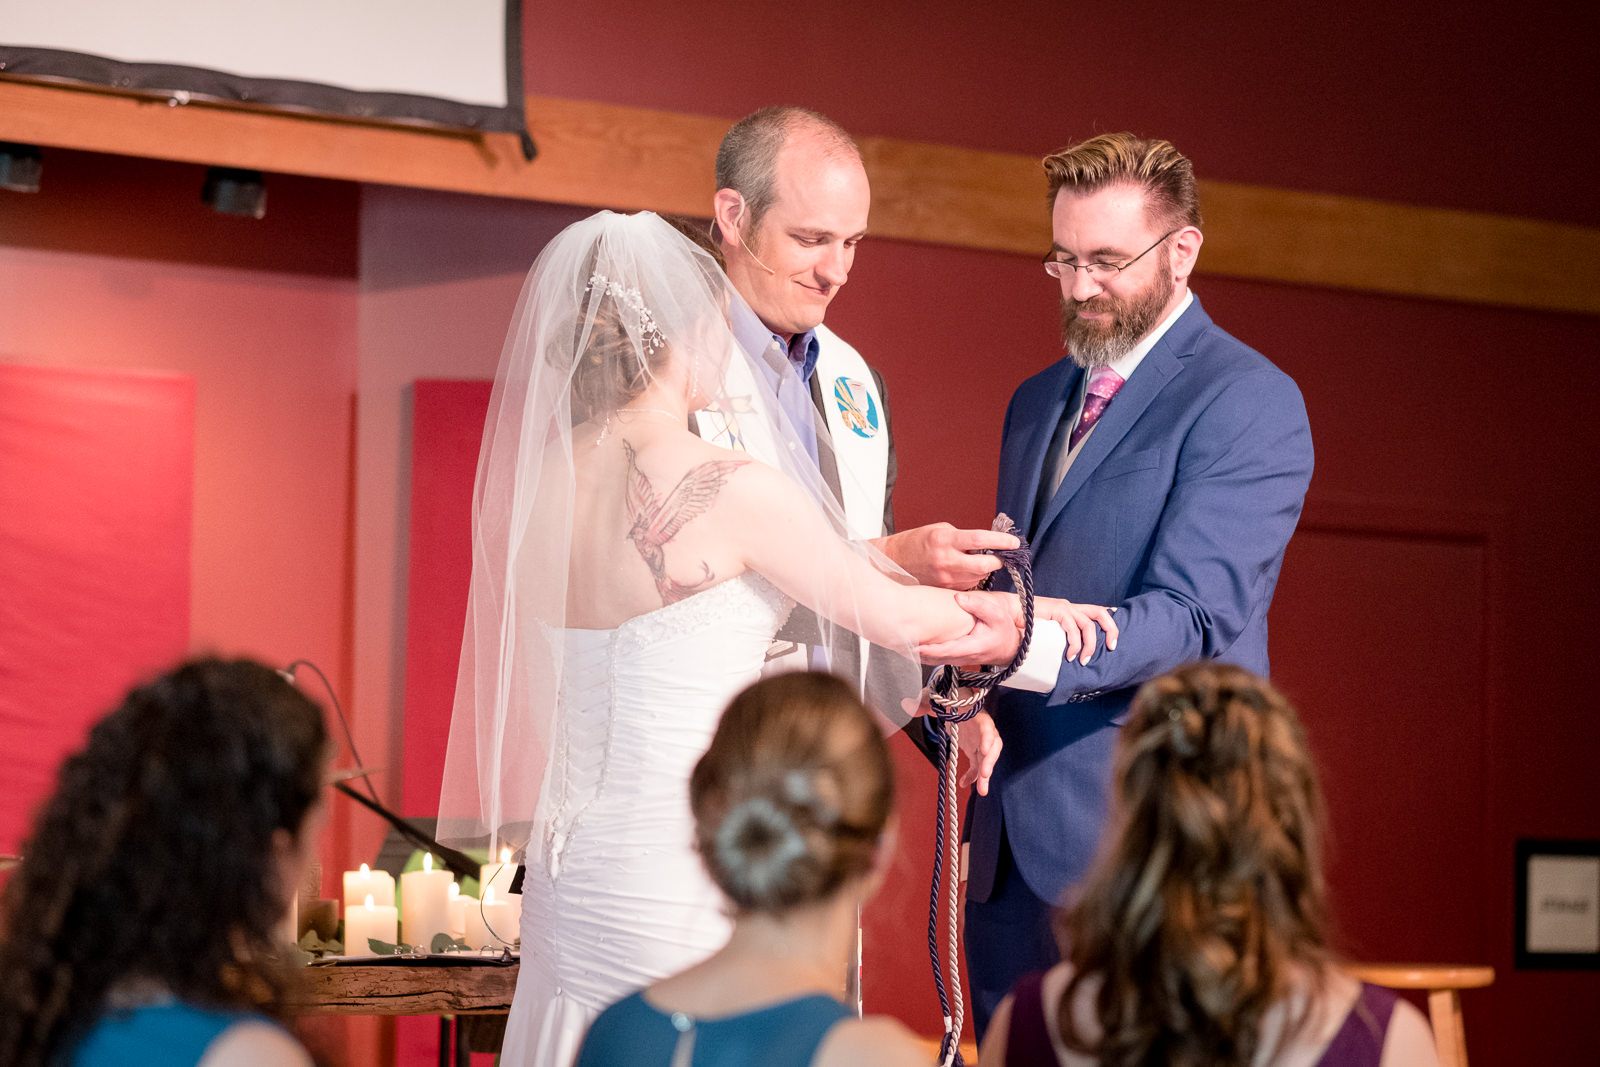 5 Rochester, NY Wedding - Rochester Museum & Science Center Reception - 050-XT2B6877.jpg